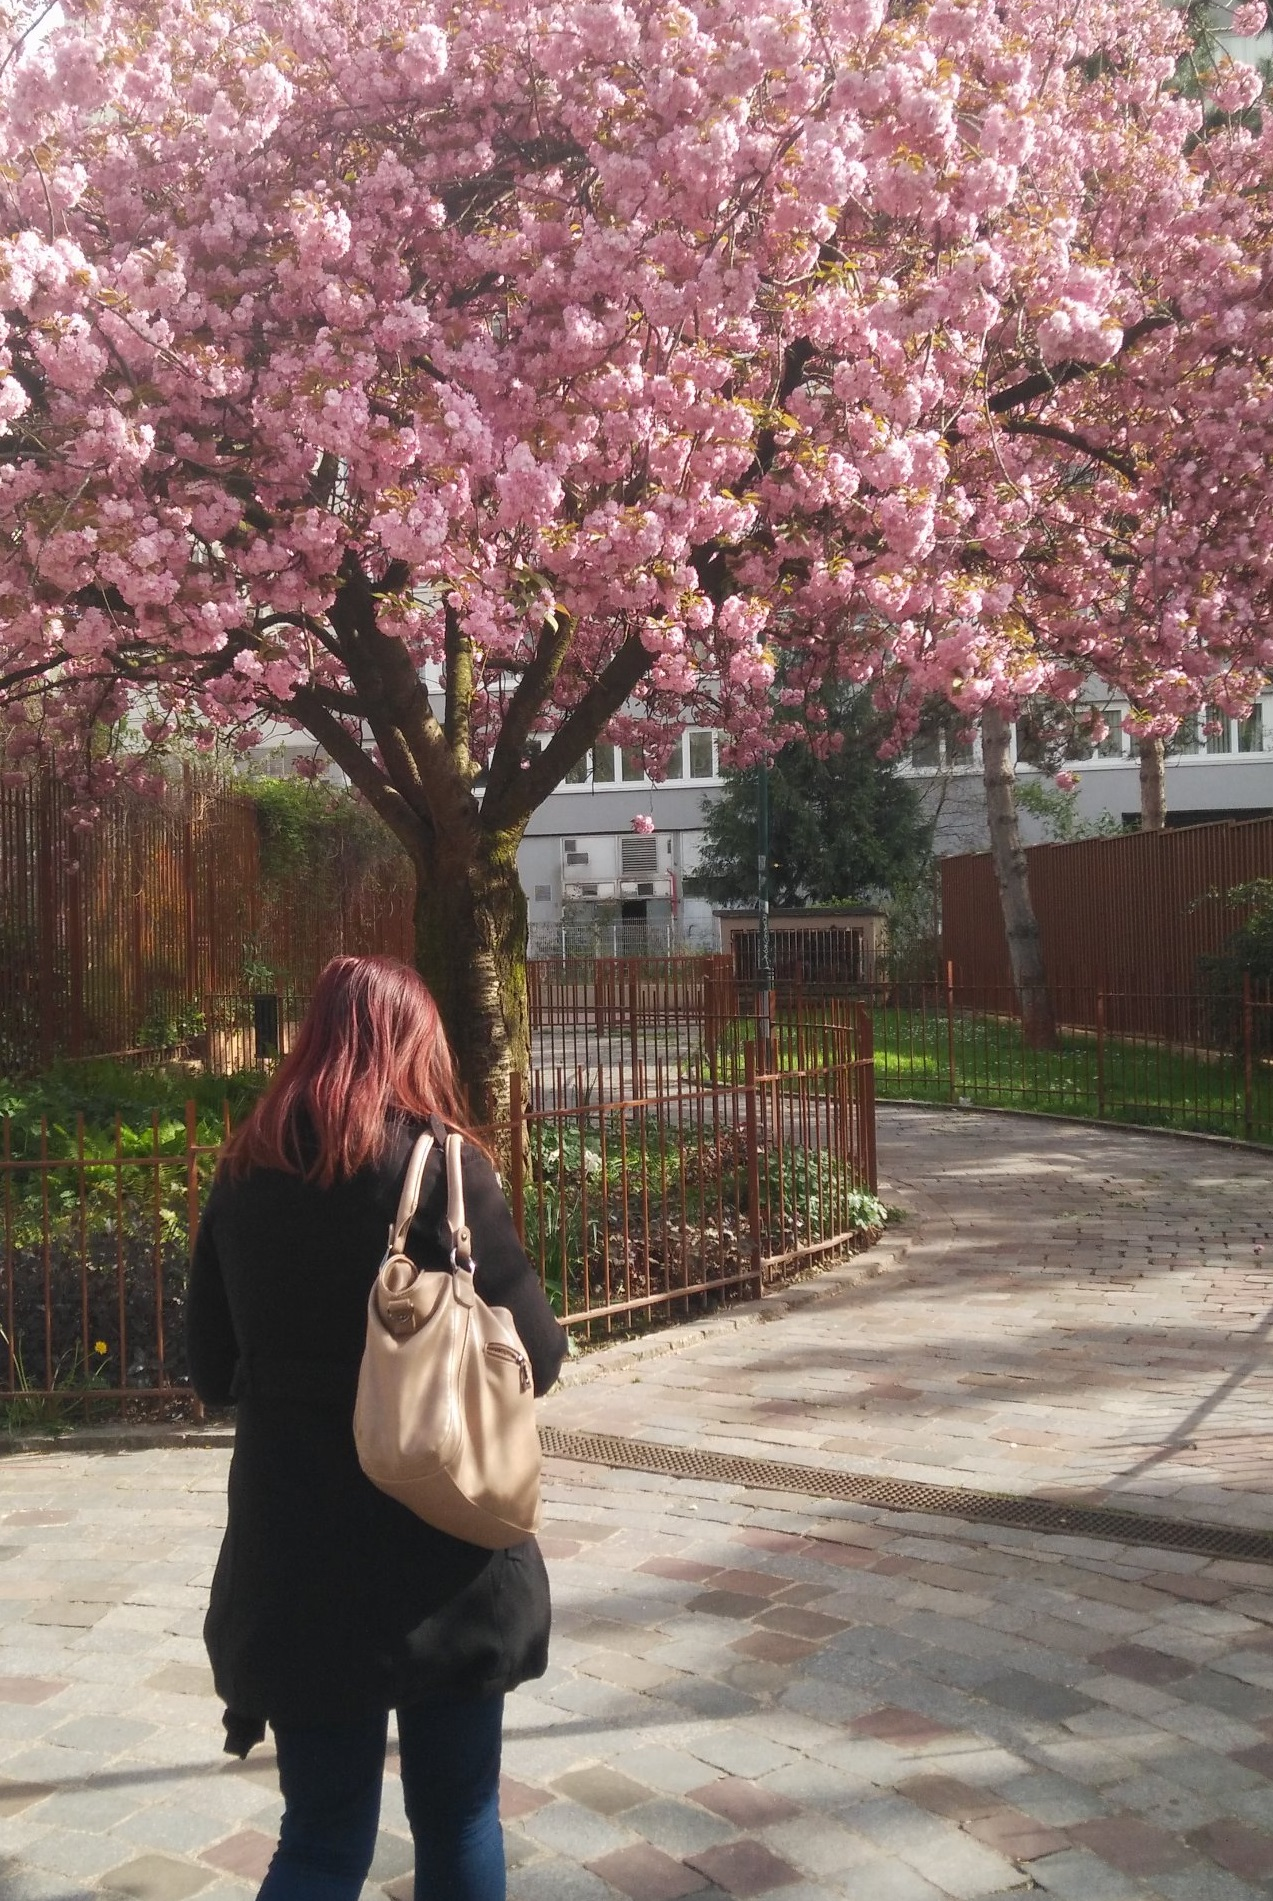 sironimo_cerisier_fleurs_avril_2017_02